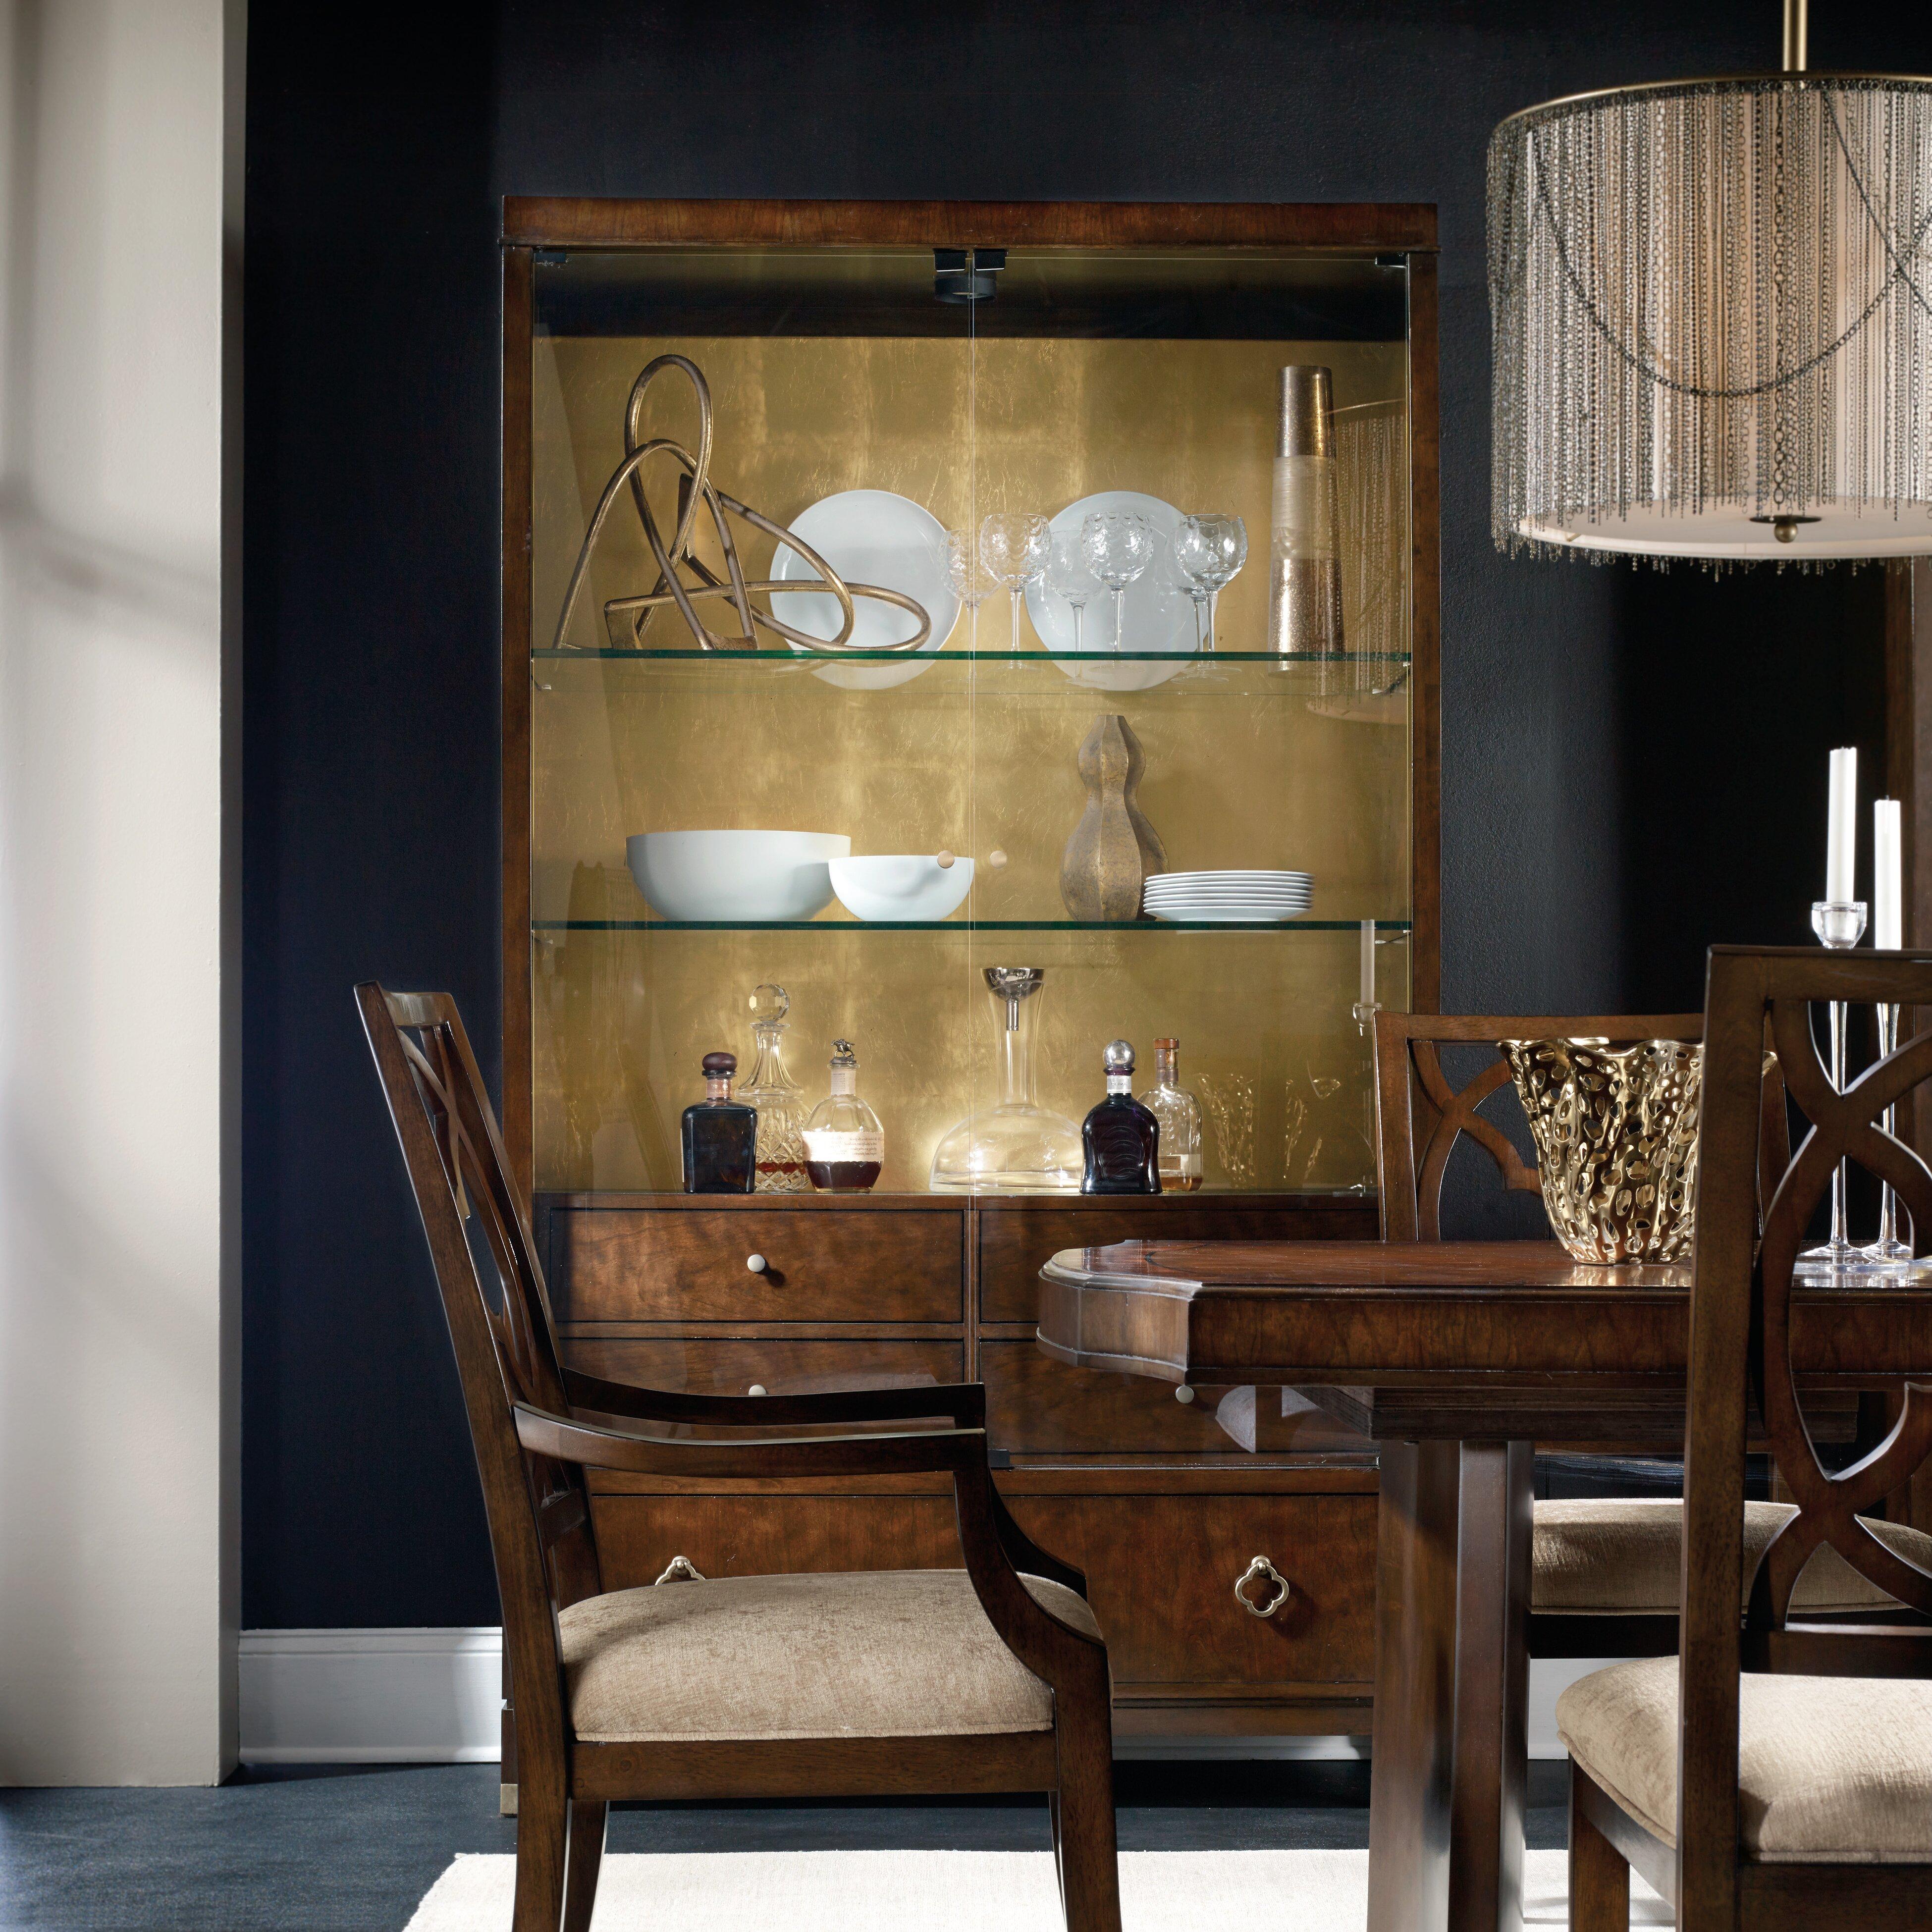 Hooker Furniture Skyline Display Stand Reviews Wayfair